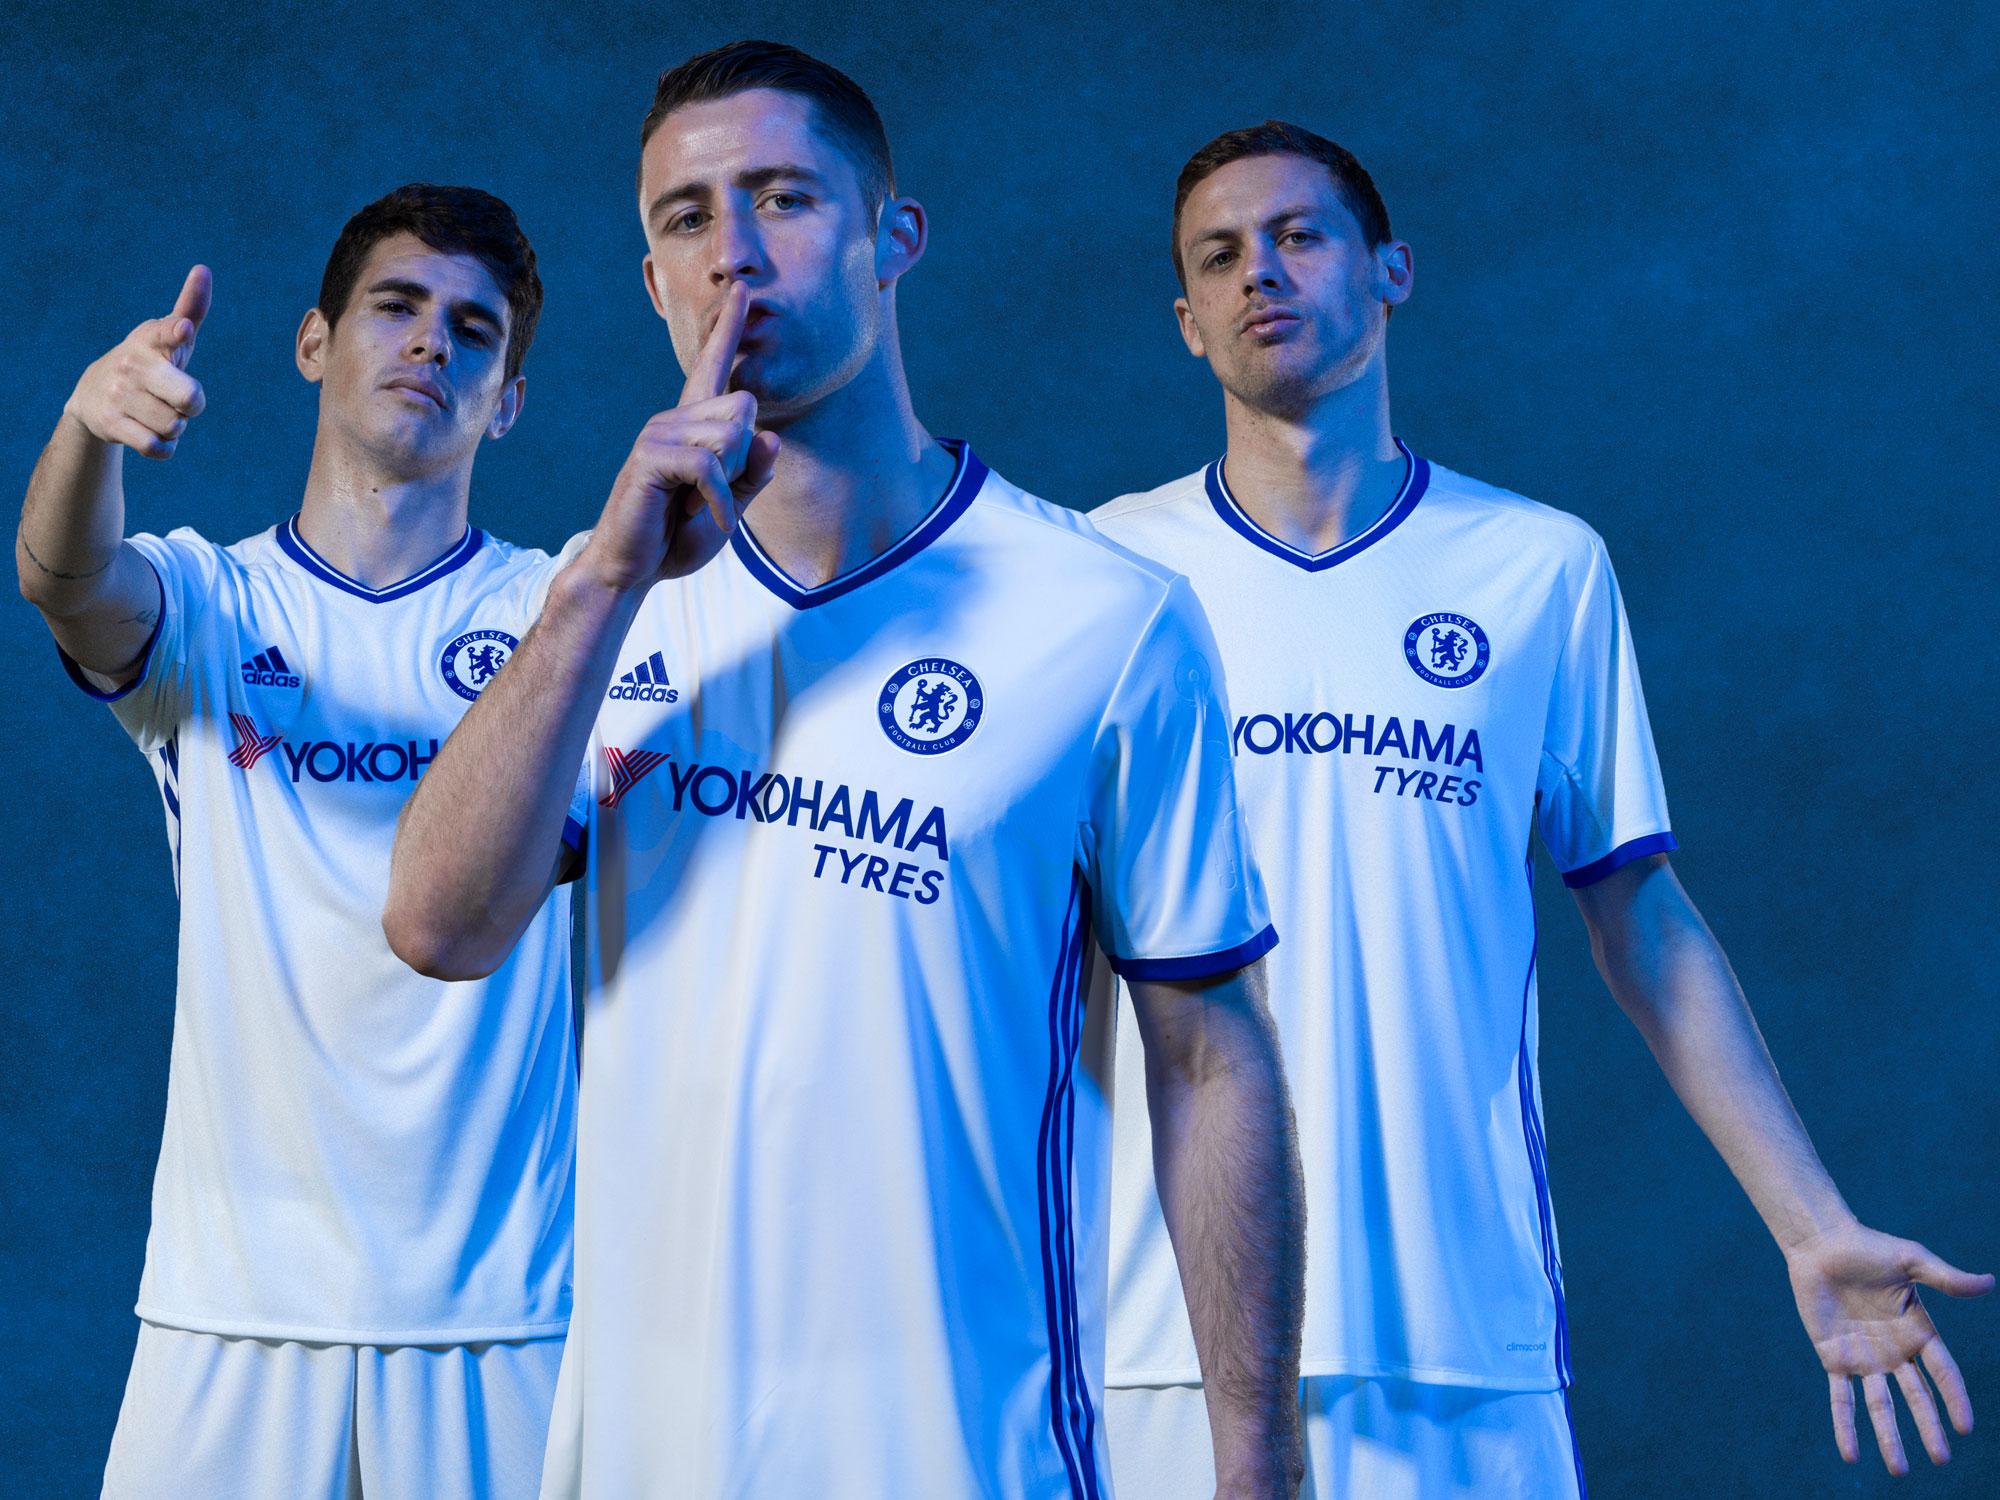 Chelsea's new third uniform